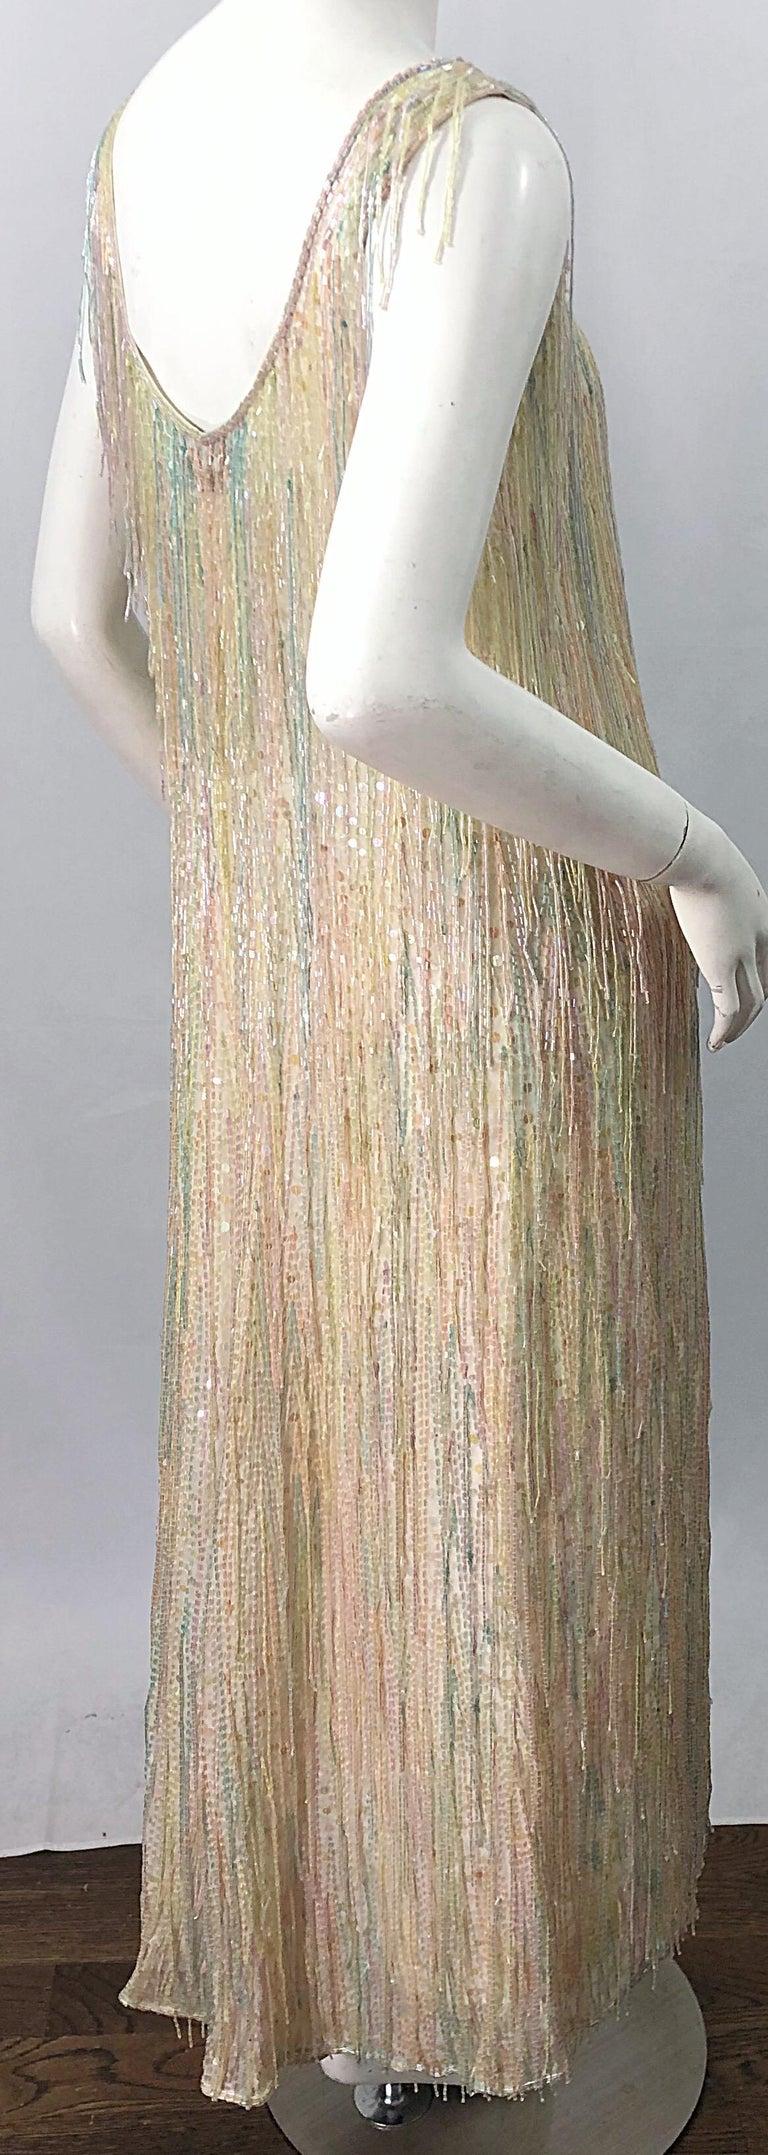 Halston MET Musuem 1970s Fully Fringed Beaded Flapper Style Vintage 70s Dress For Sale 10